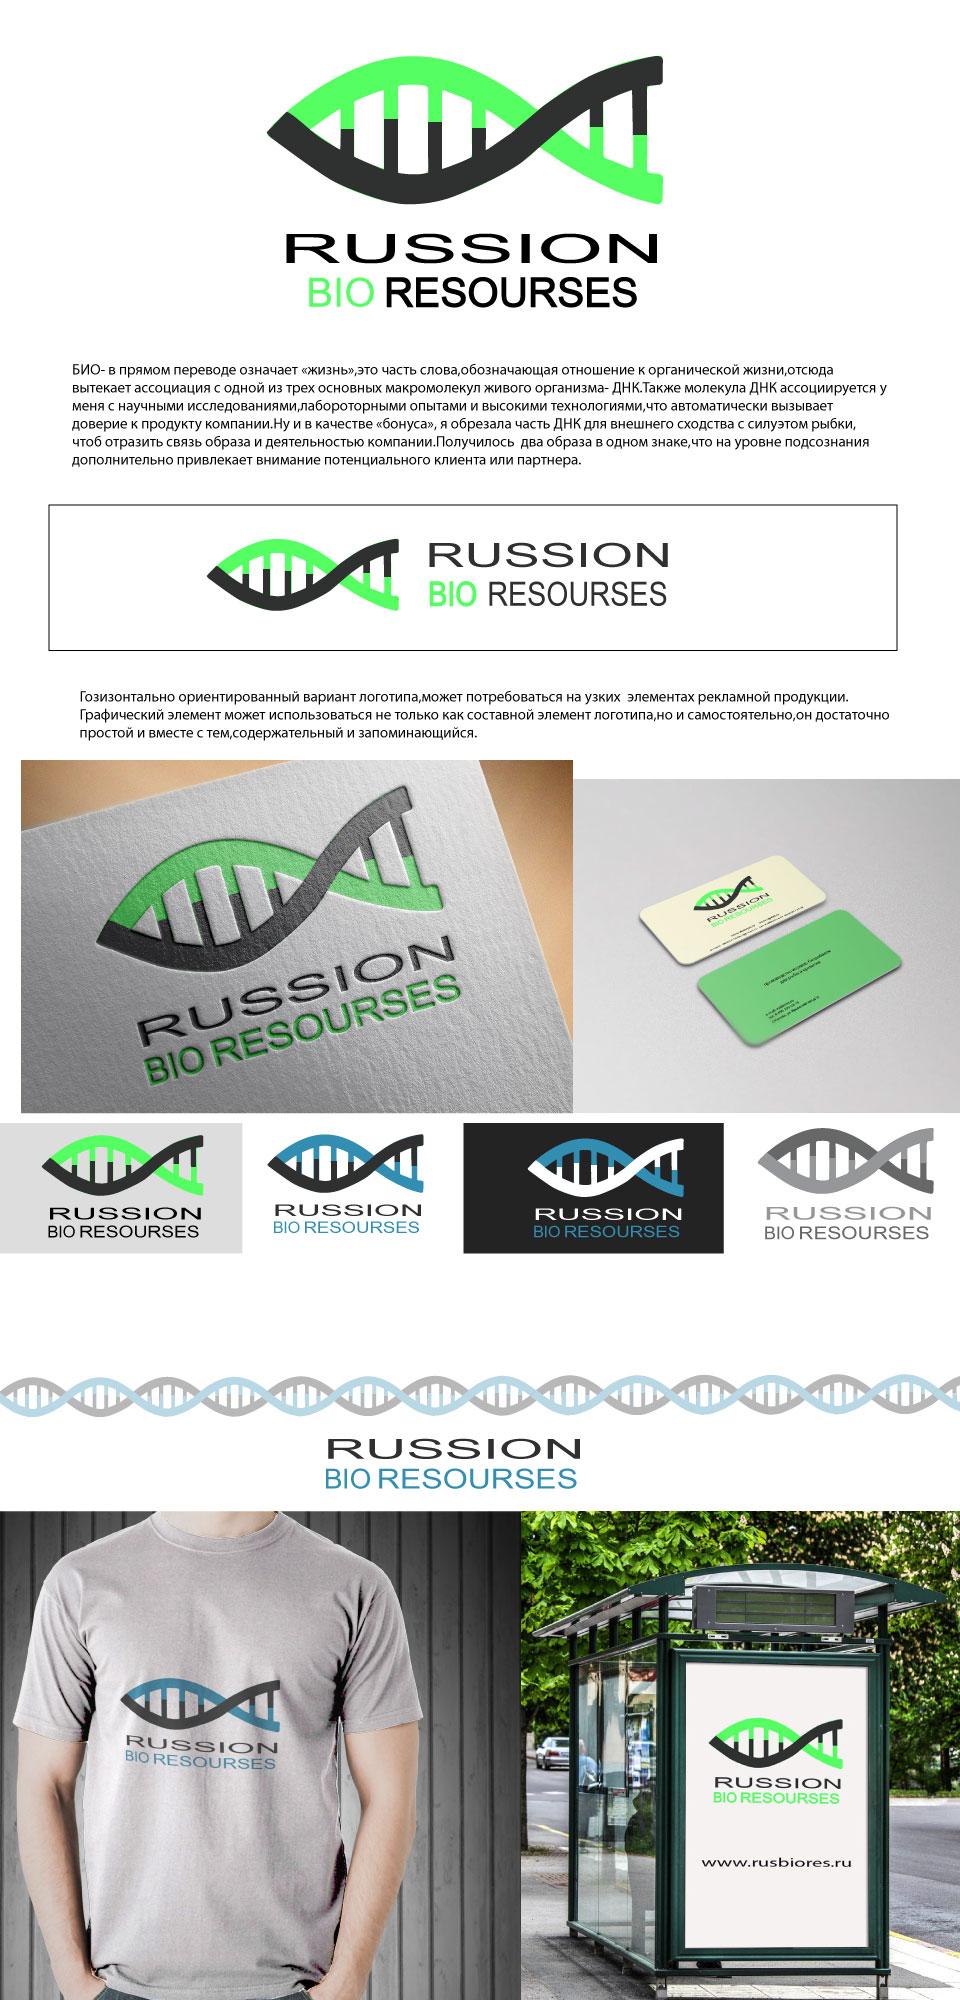 Разработка логотипа для компании «Русские Био Ресурсы» фото f_79358fb7e6eab9e2.jpg